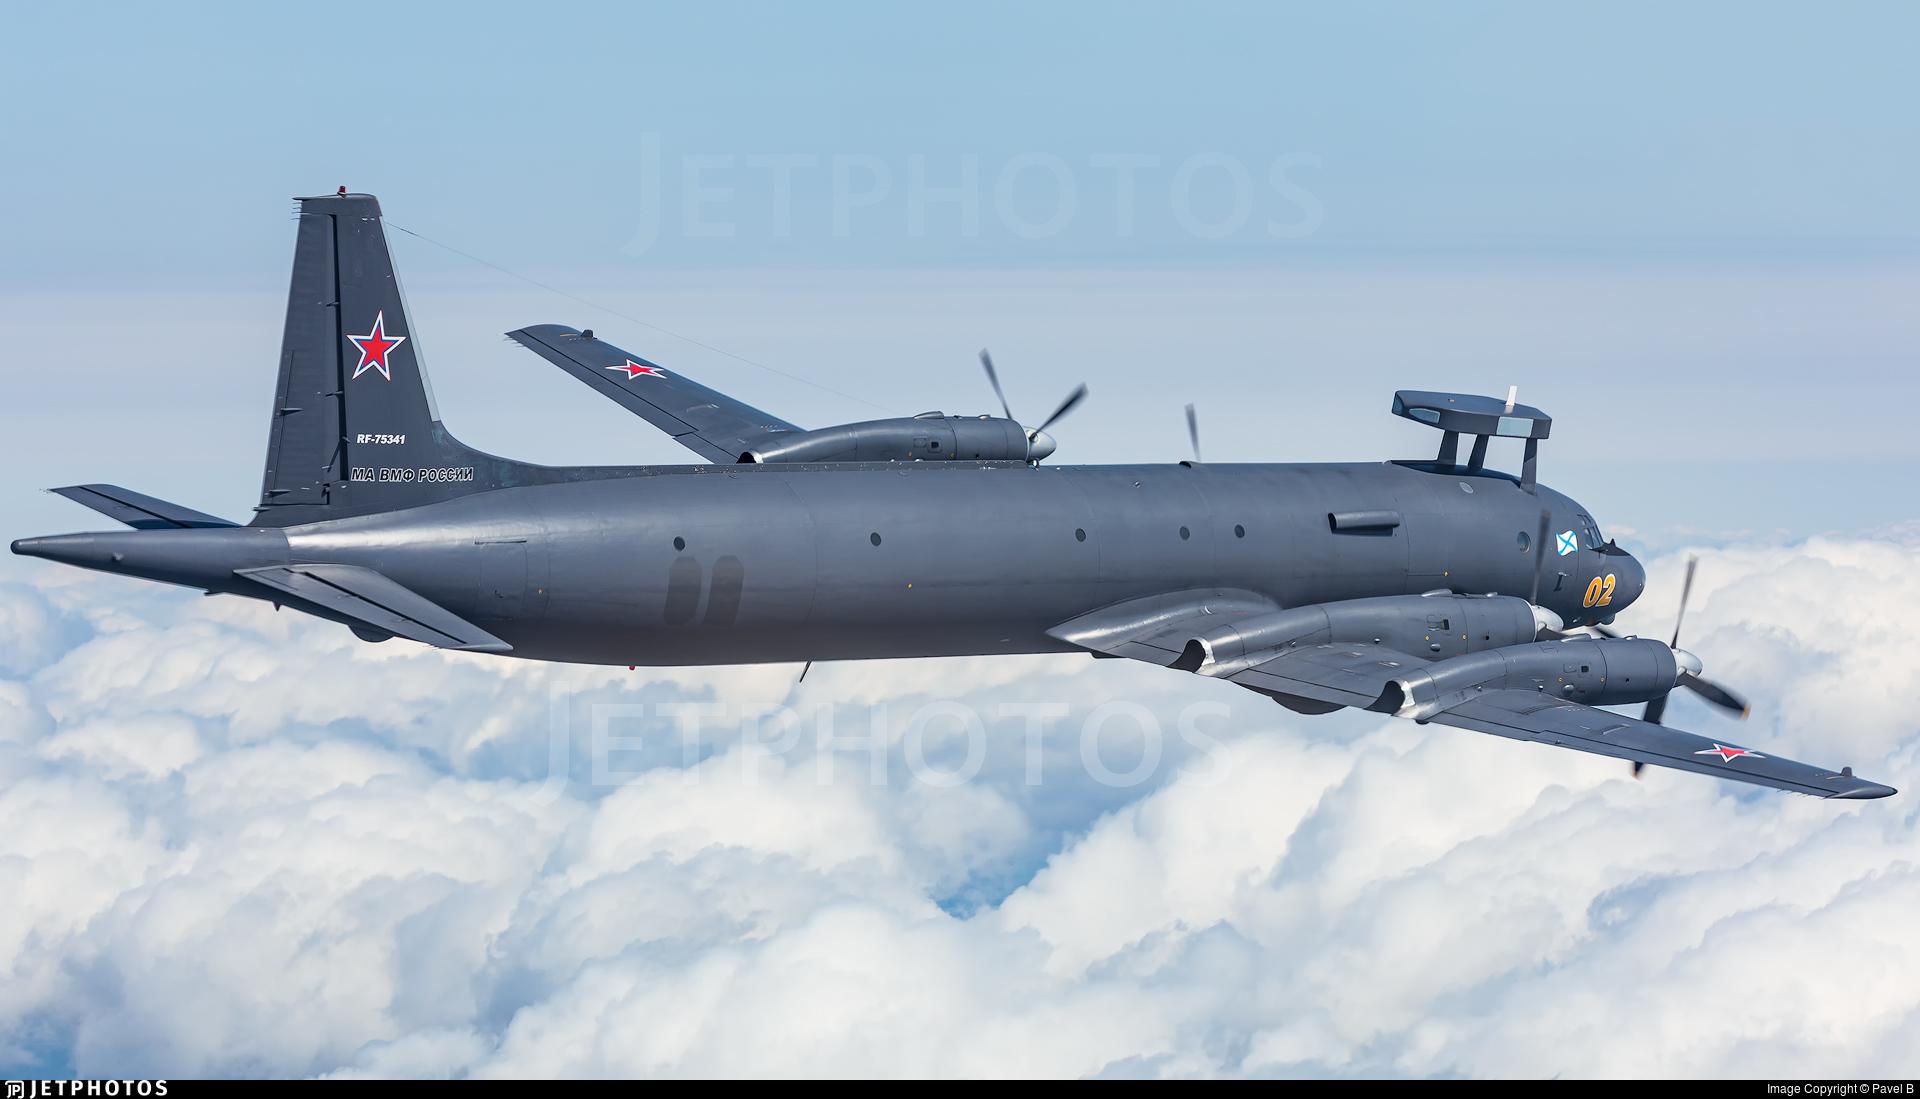 RF-75341 - Ilyushin IL-38 May - Russia - Navy